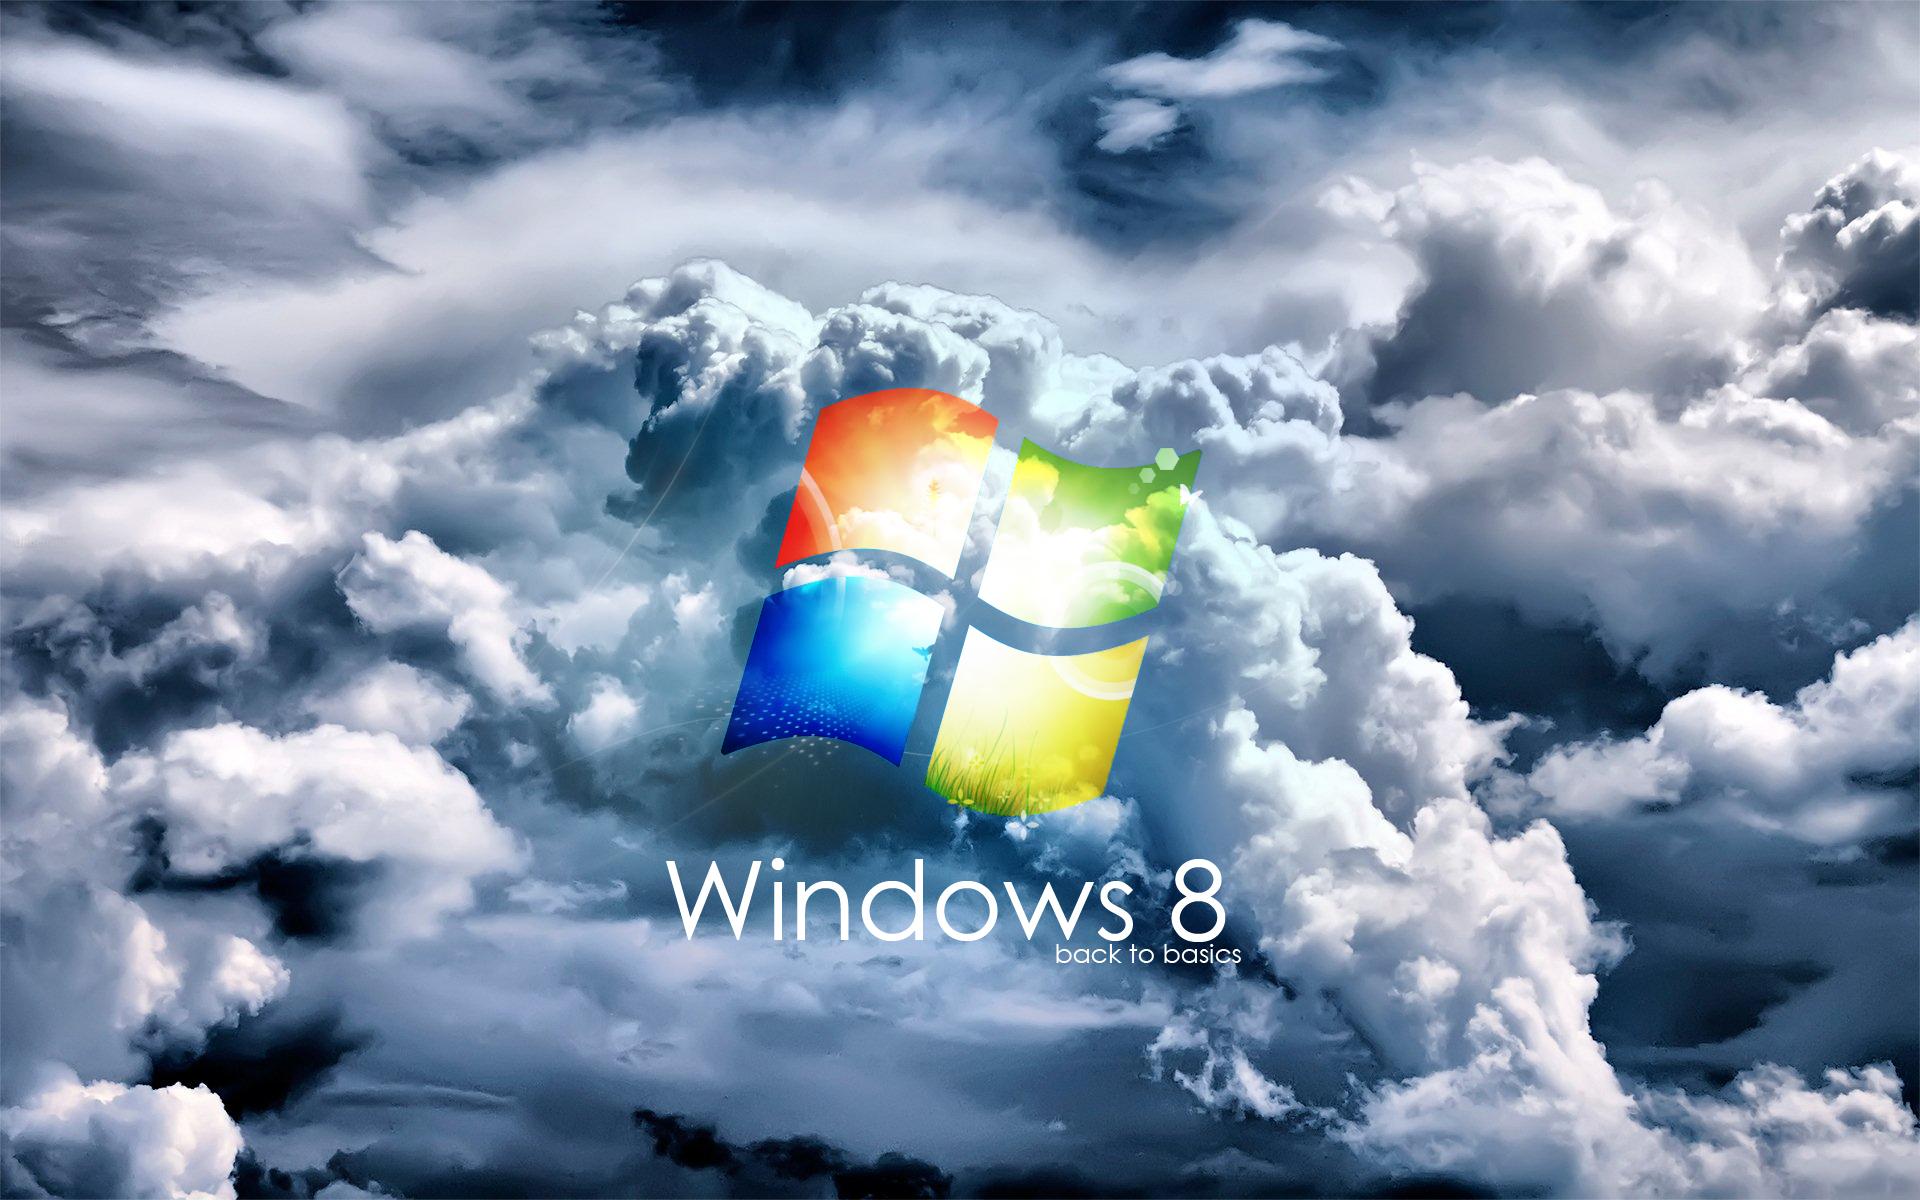 1920x1200 Windows 8 clouds desktop PC and Mac wallpaper 1920x1200